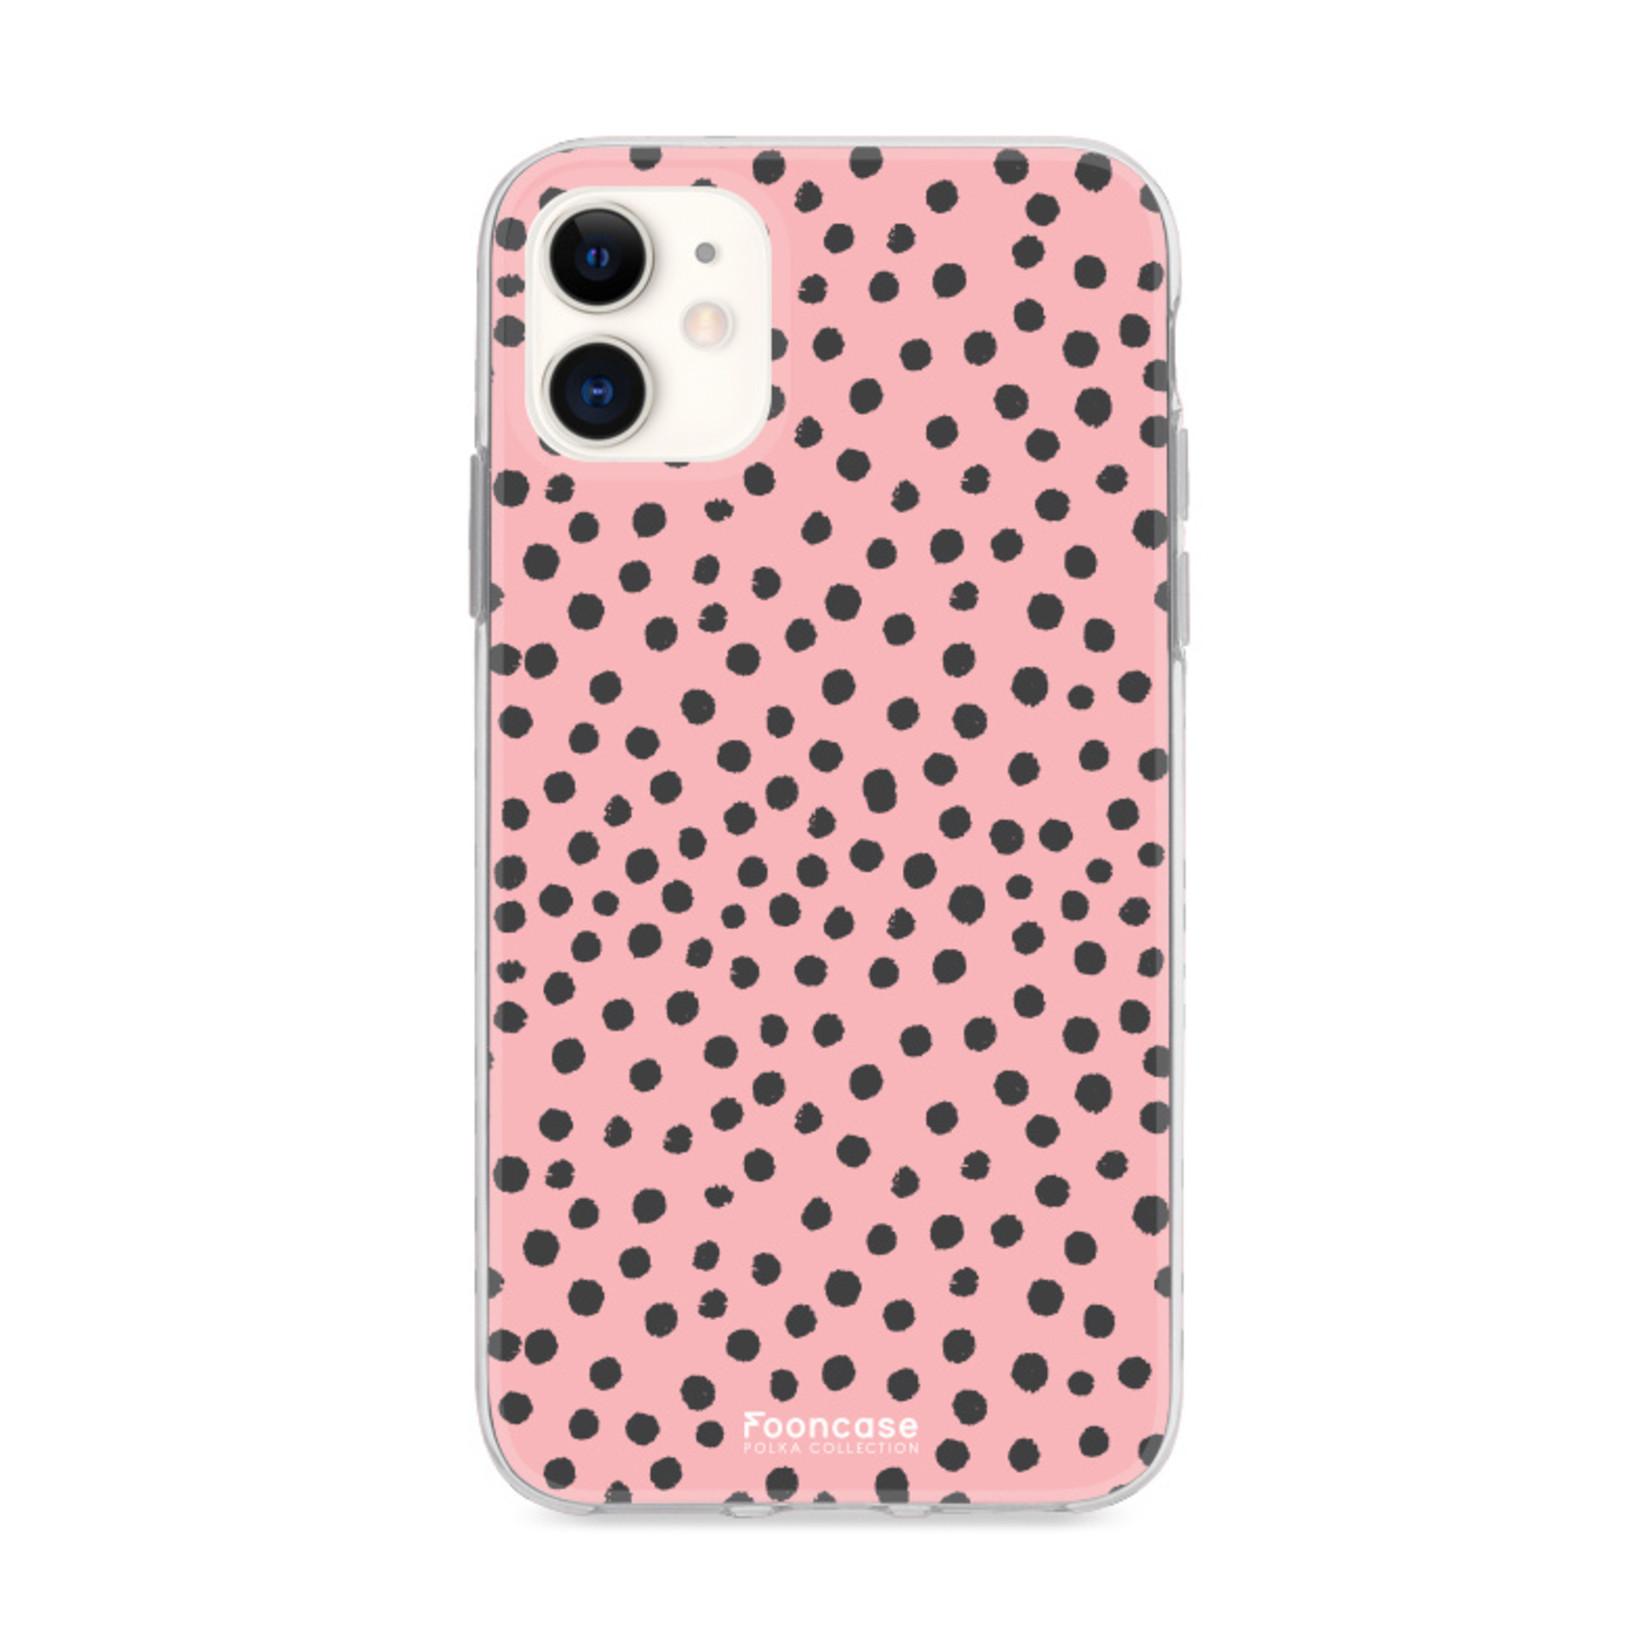 FOONCASE iPhone 12 hoesje TPU Soft Case - Back Cover - POLKA COLLECTION / Stipjes / Stippen / Roze